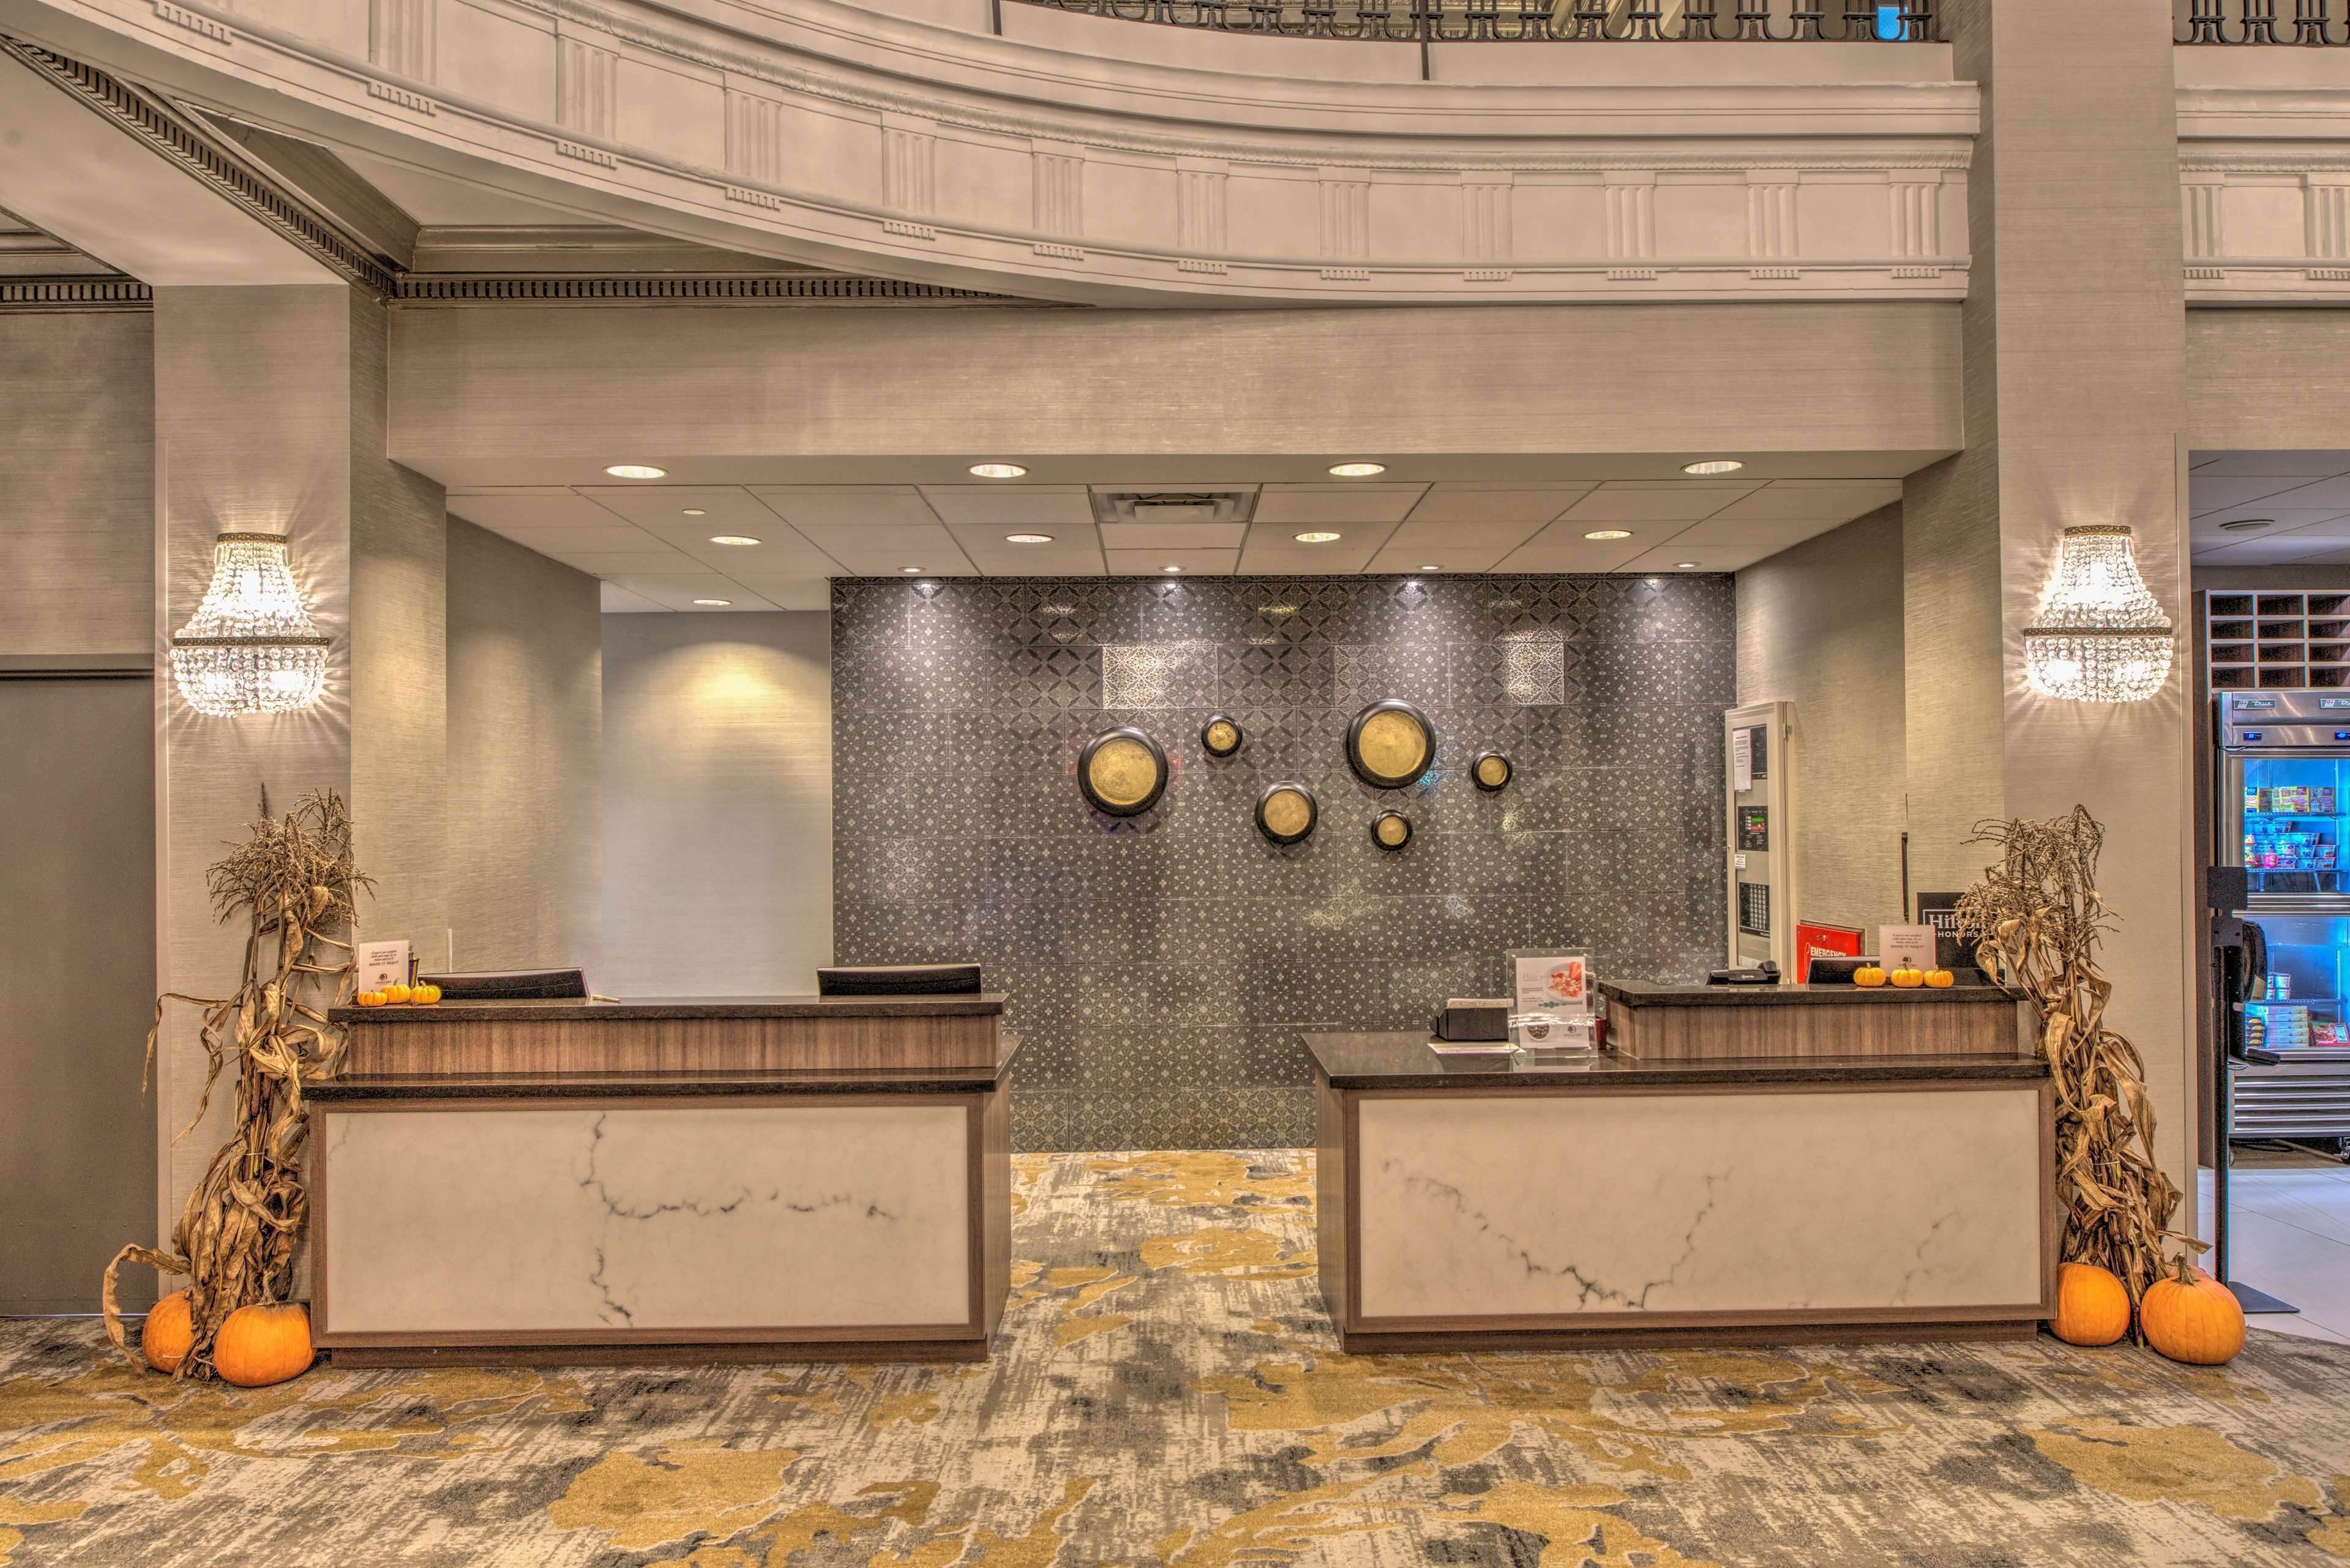 DoubleTree by Hilton Utica image 7